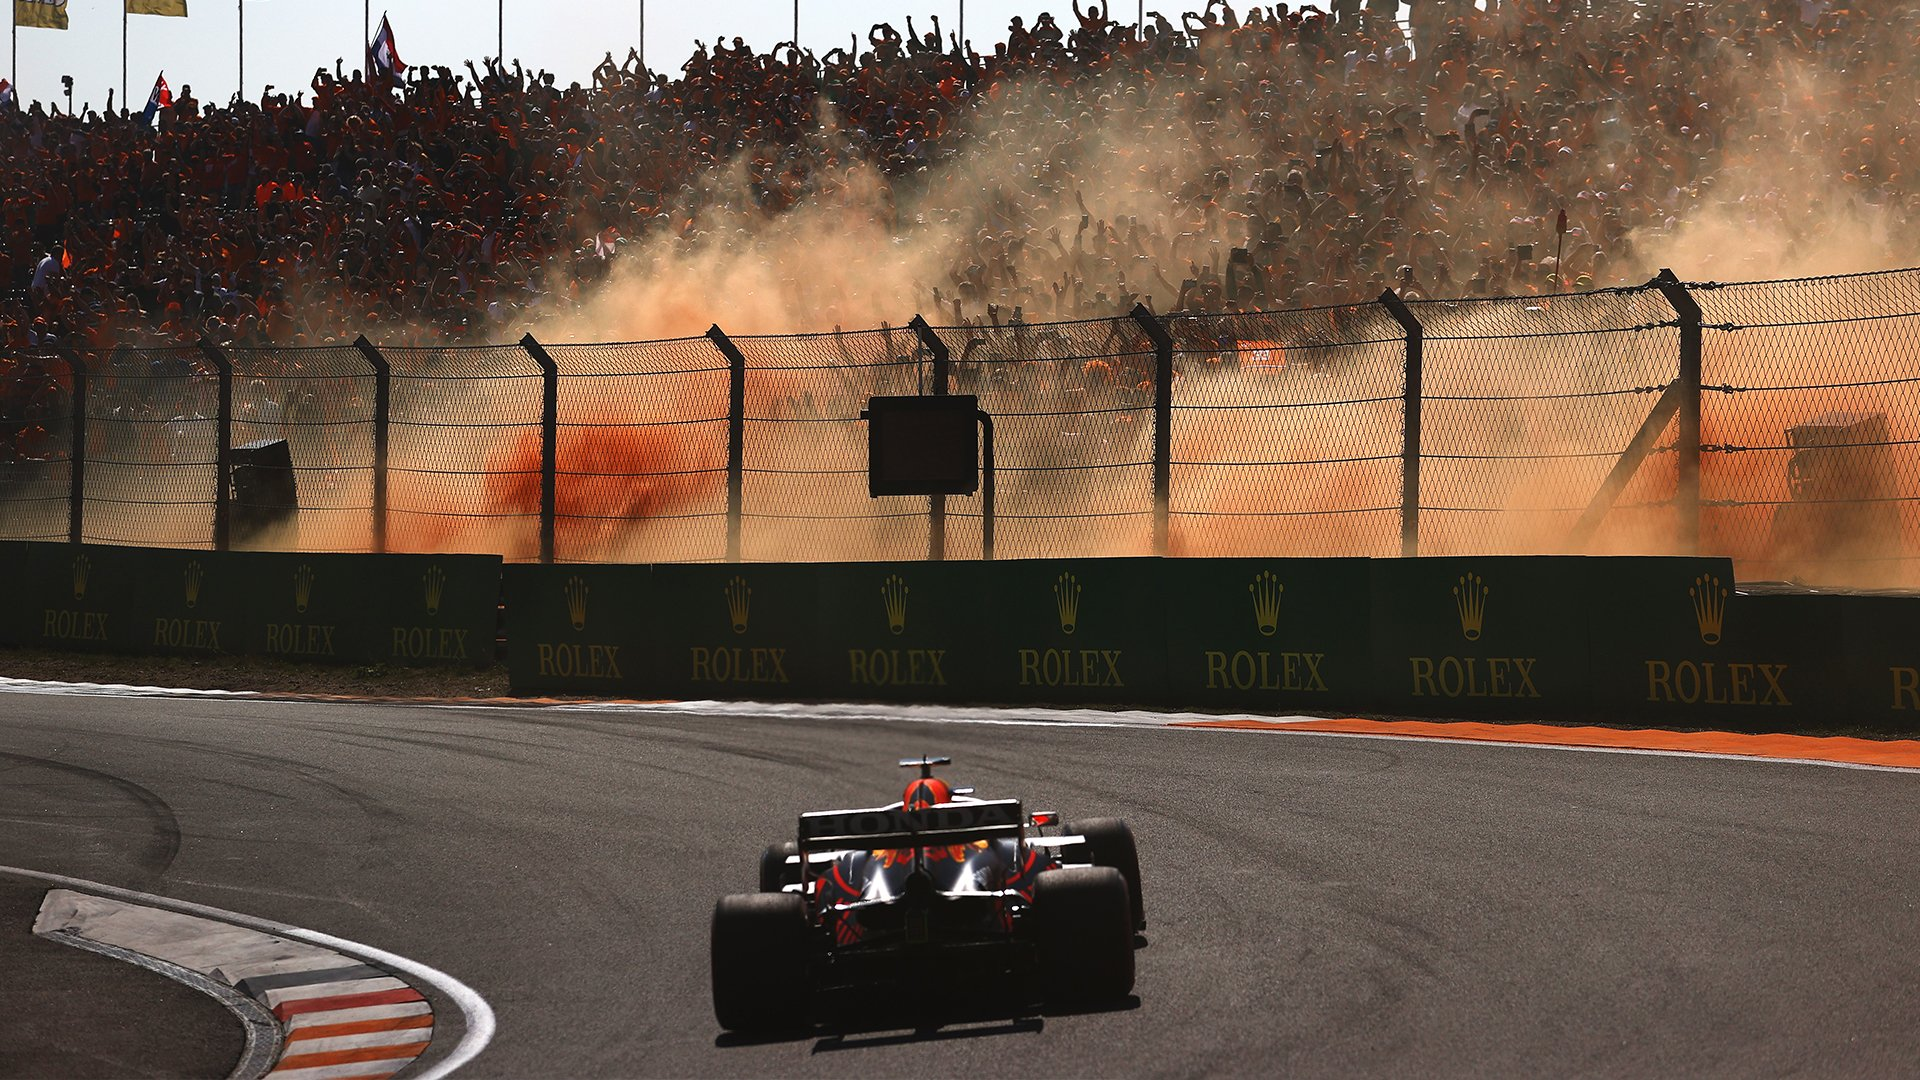 Gara, Gp d'Olanda: Max Verstappen domina a casa sua. Ferrari 5° e 7°.